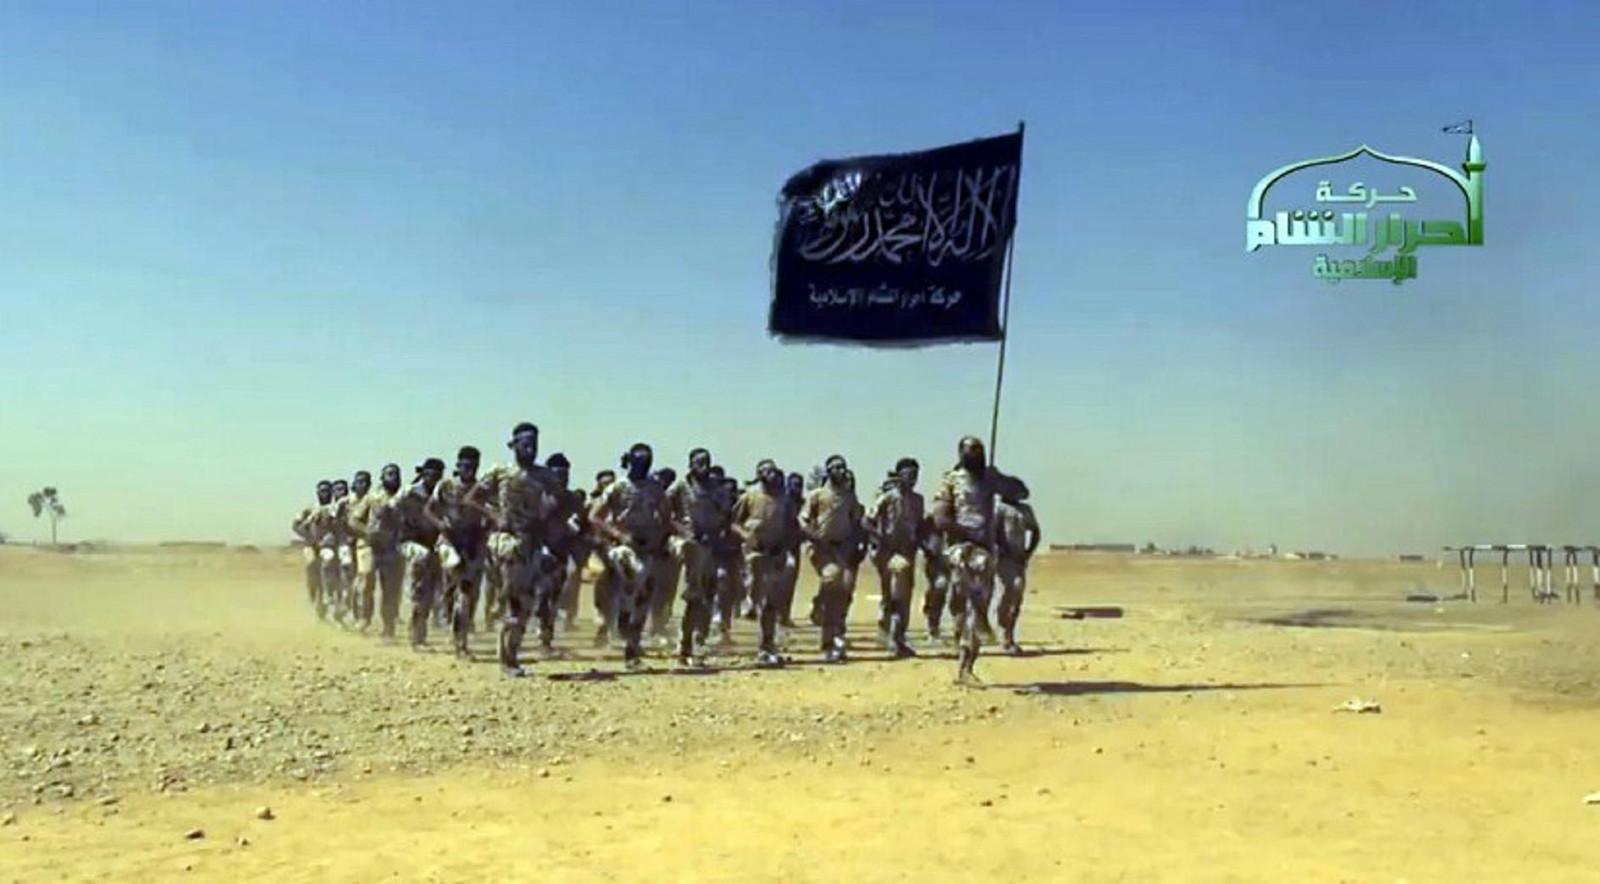 Rebellen van Ahrar al-Sham in 2016.